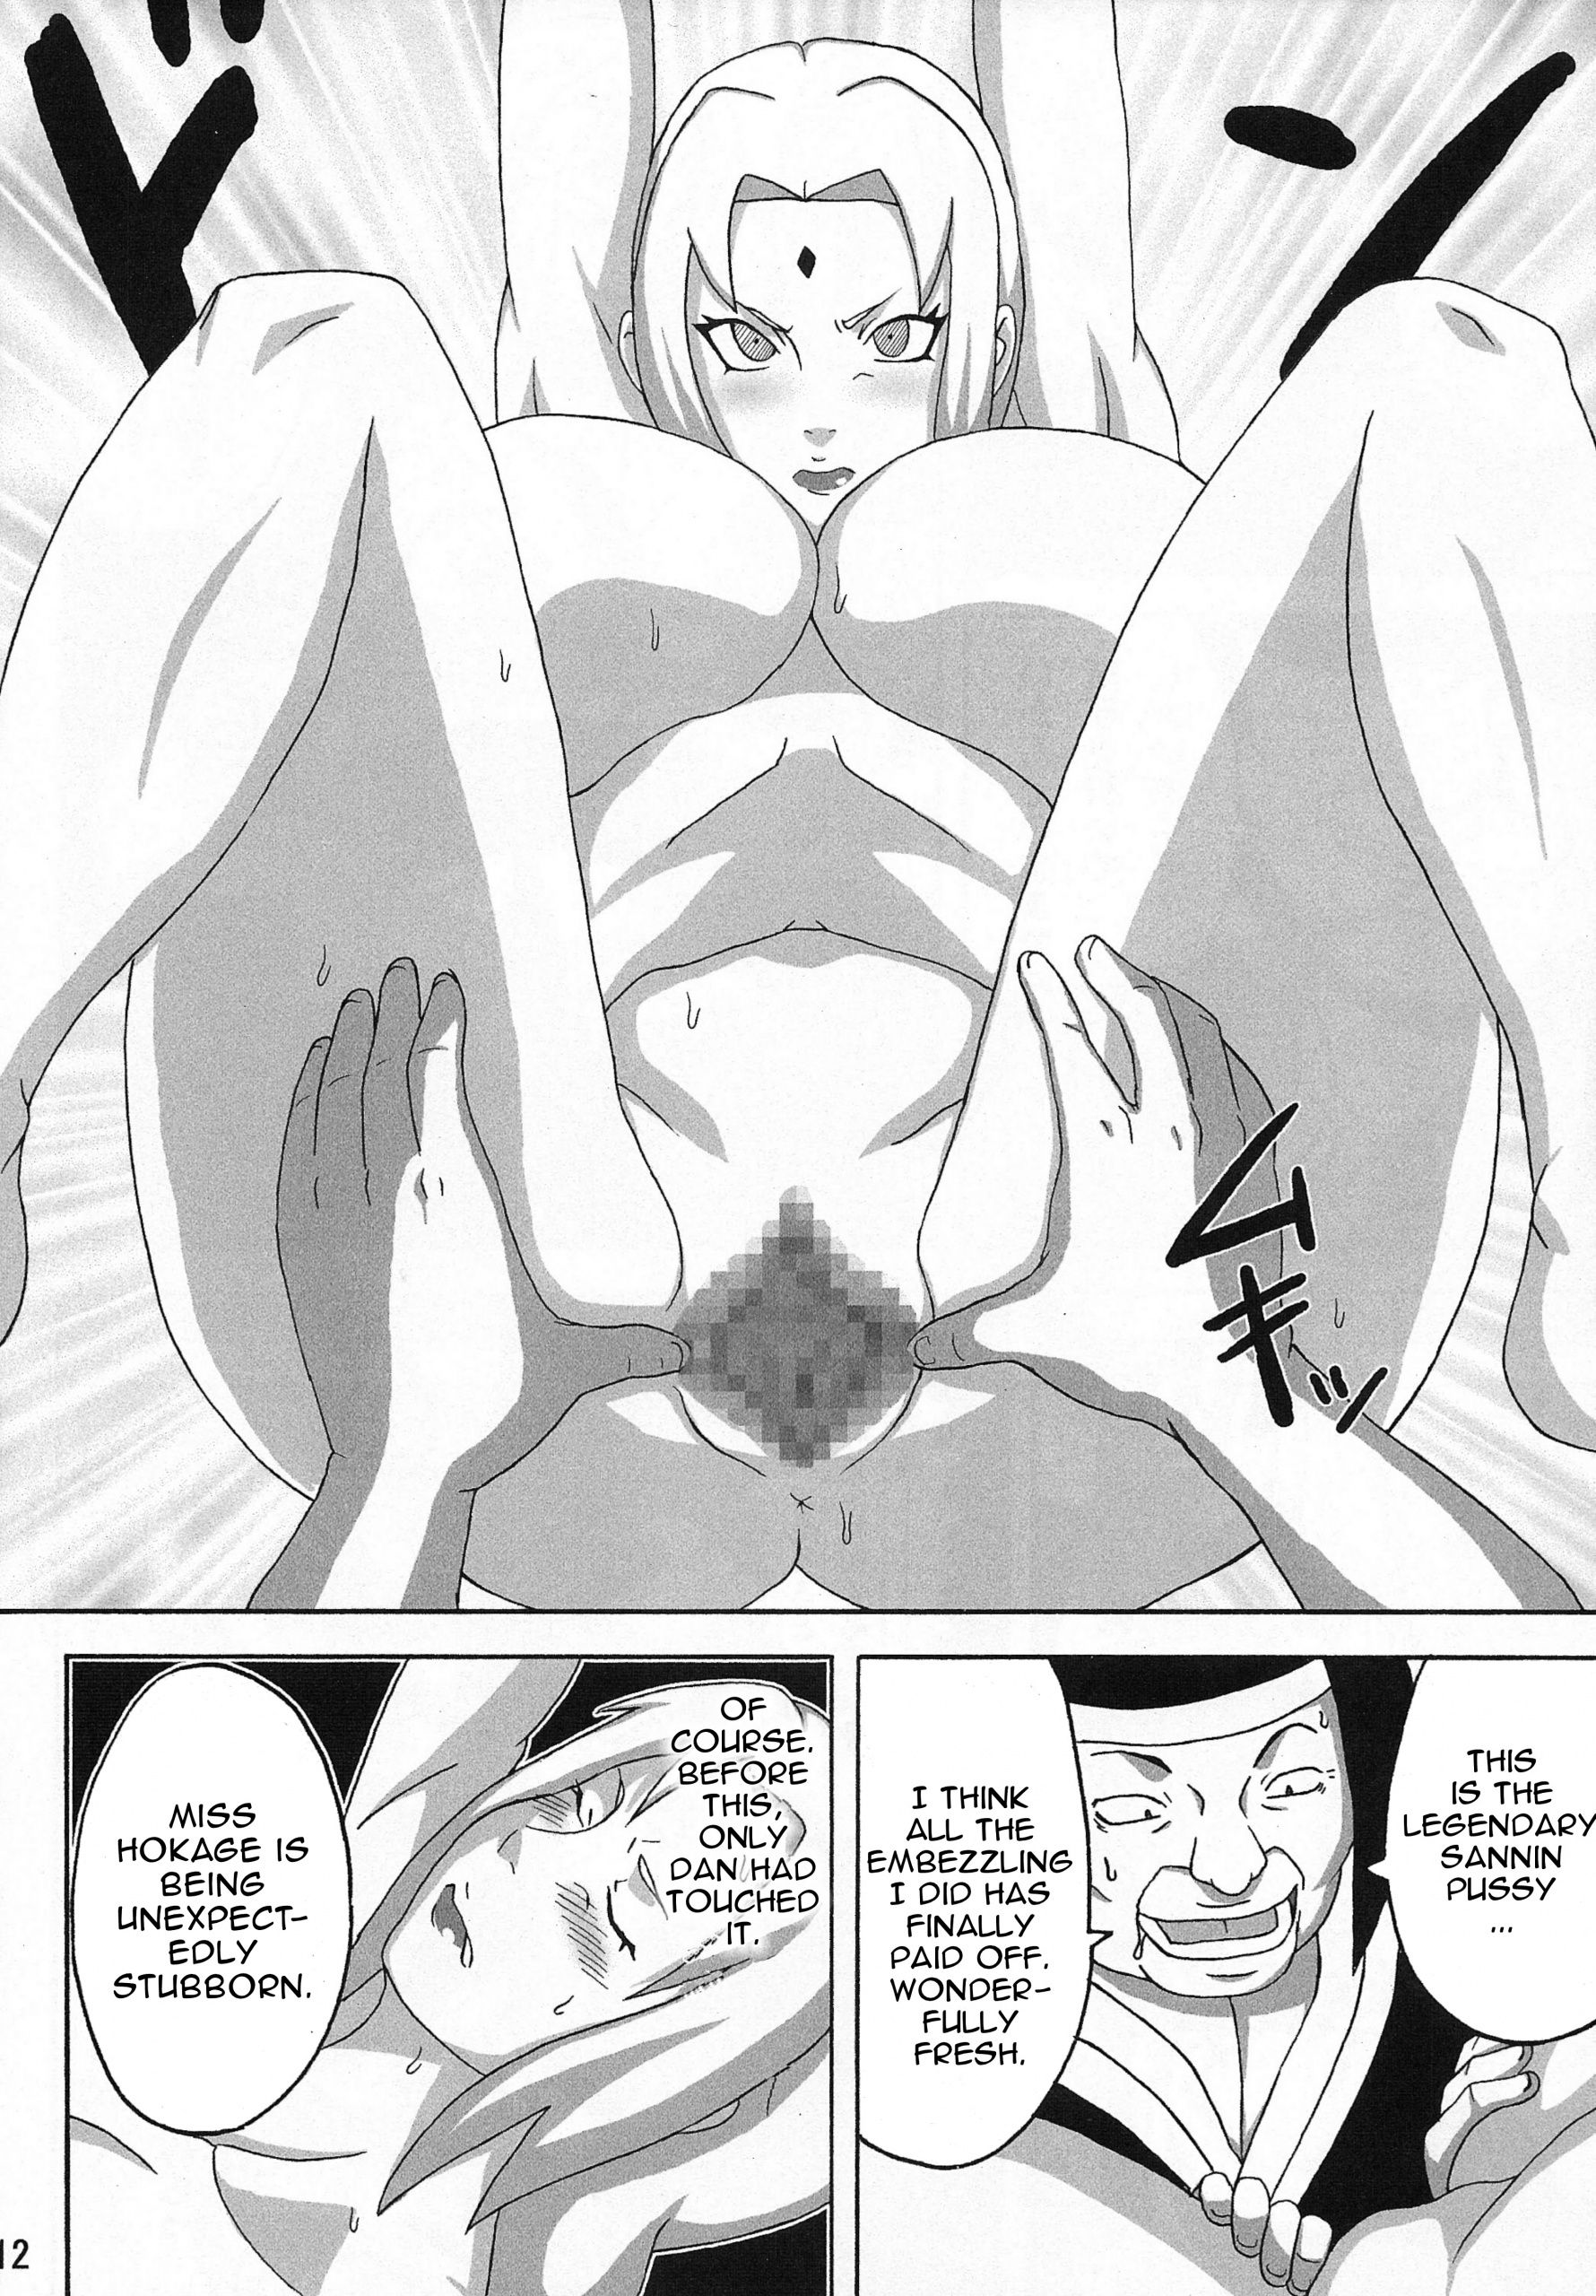 Tsunades lewd reception party hentai manga picture 13